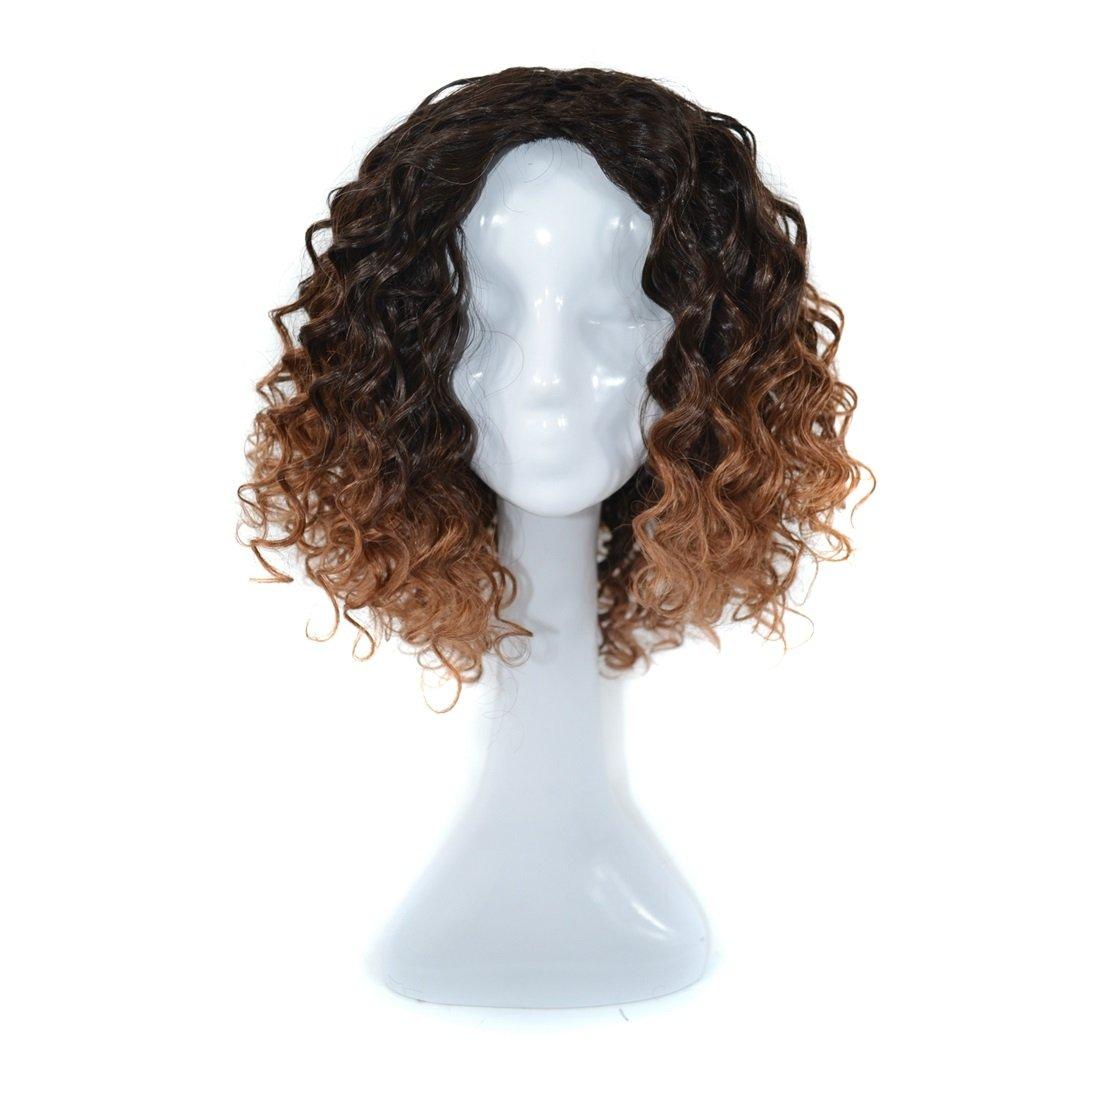 JIANFU 300グラムリアルフルウィッグ女性のためのヨーロピアンとアメリカンブラックDEEPスモールボリュームカーリーウィッグリアルな自然な人間の髪のために中傷と合成のデイリーウィッグ (Color : Black dark brown 1BT30#) B07MYL4FSS Black dark brown 1BT30#